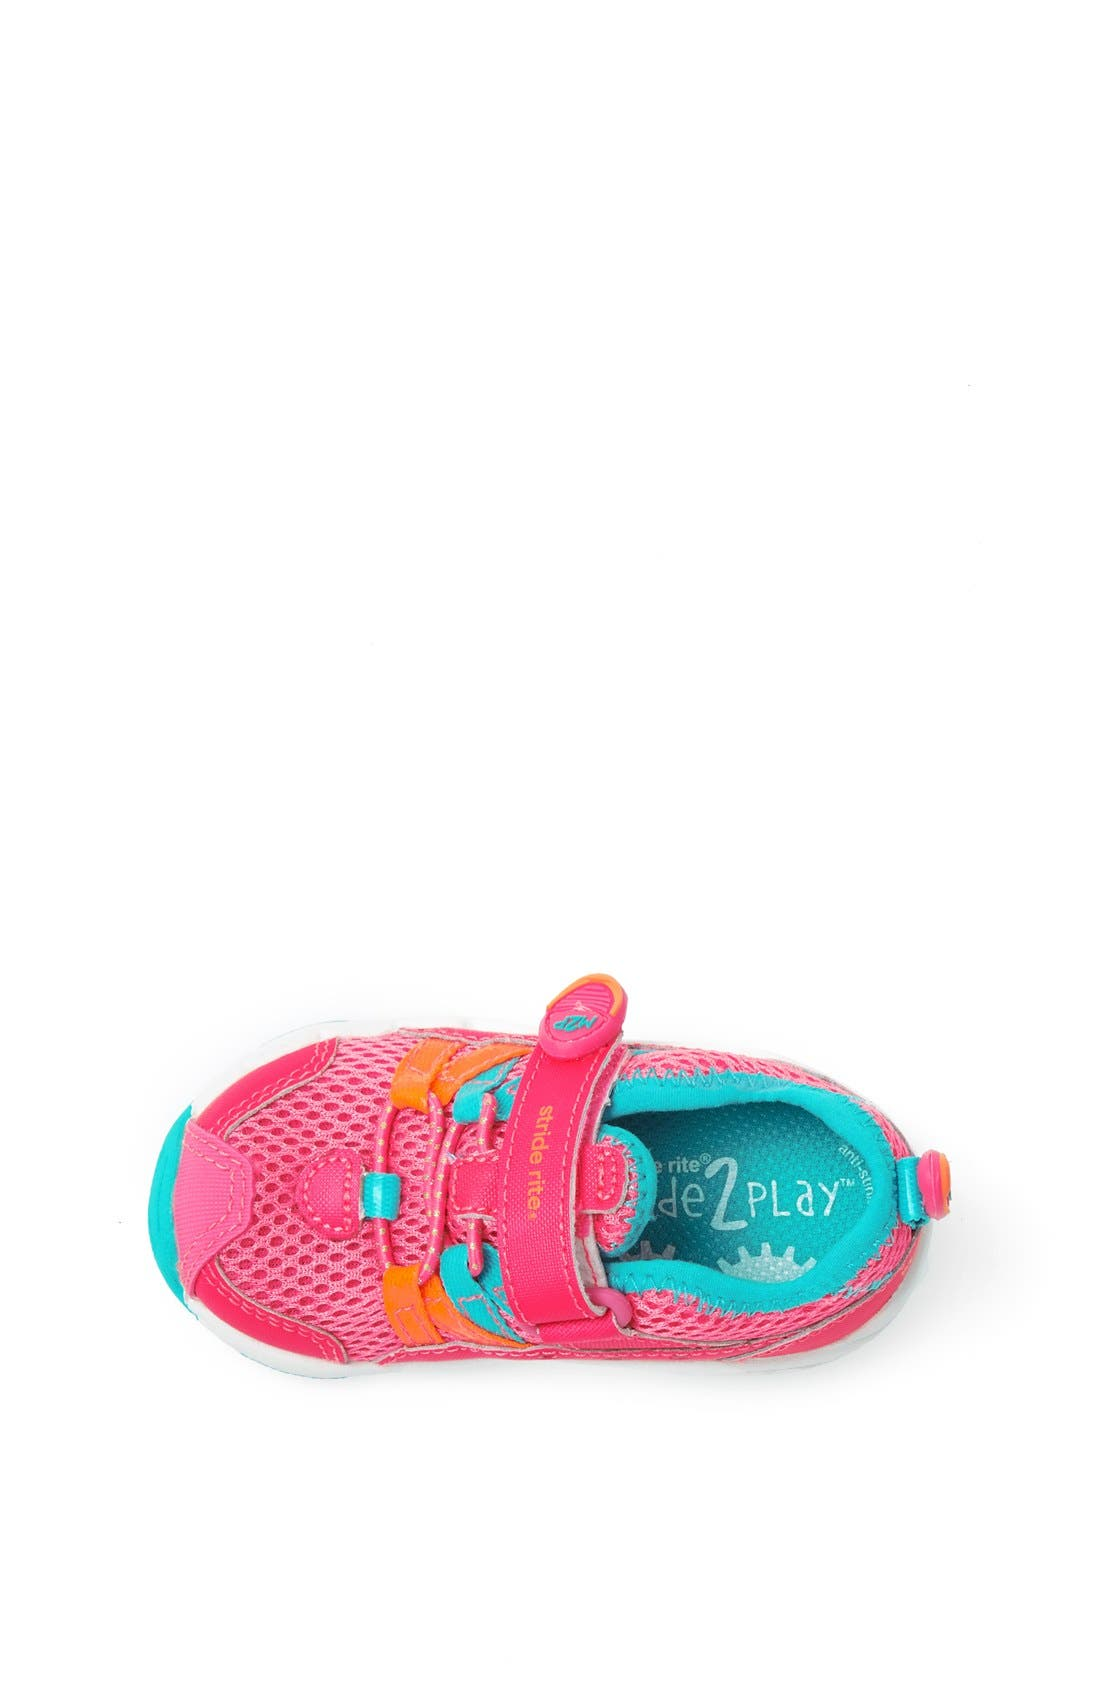 Alternate Image 3  - Stride Rite 'Made 2 Play™ - Aqua' Sneaker (Baby, Walker & Toddler)